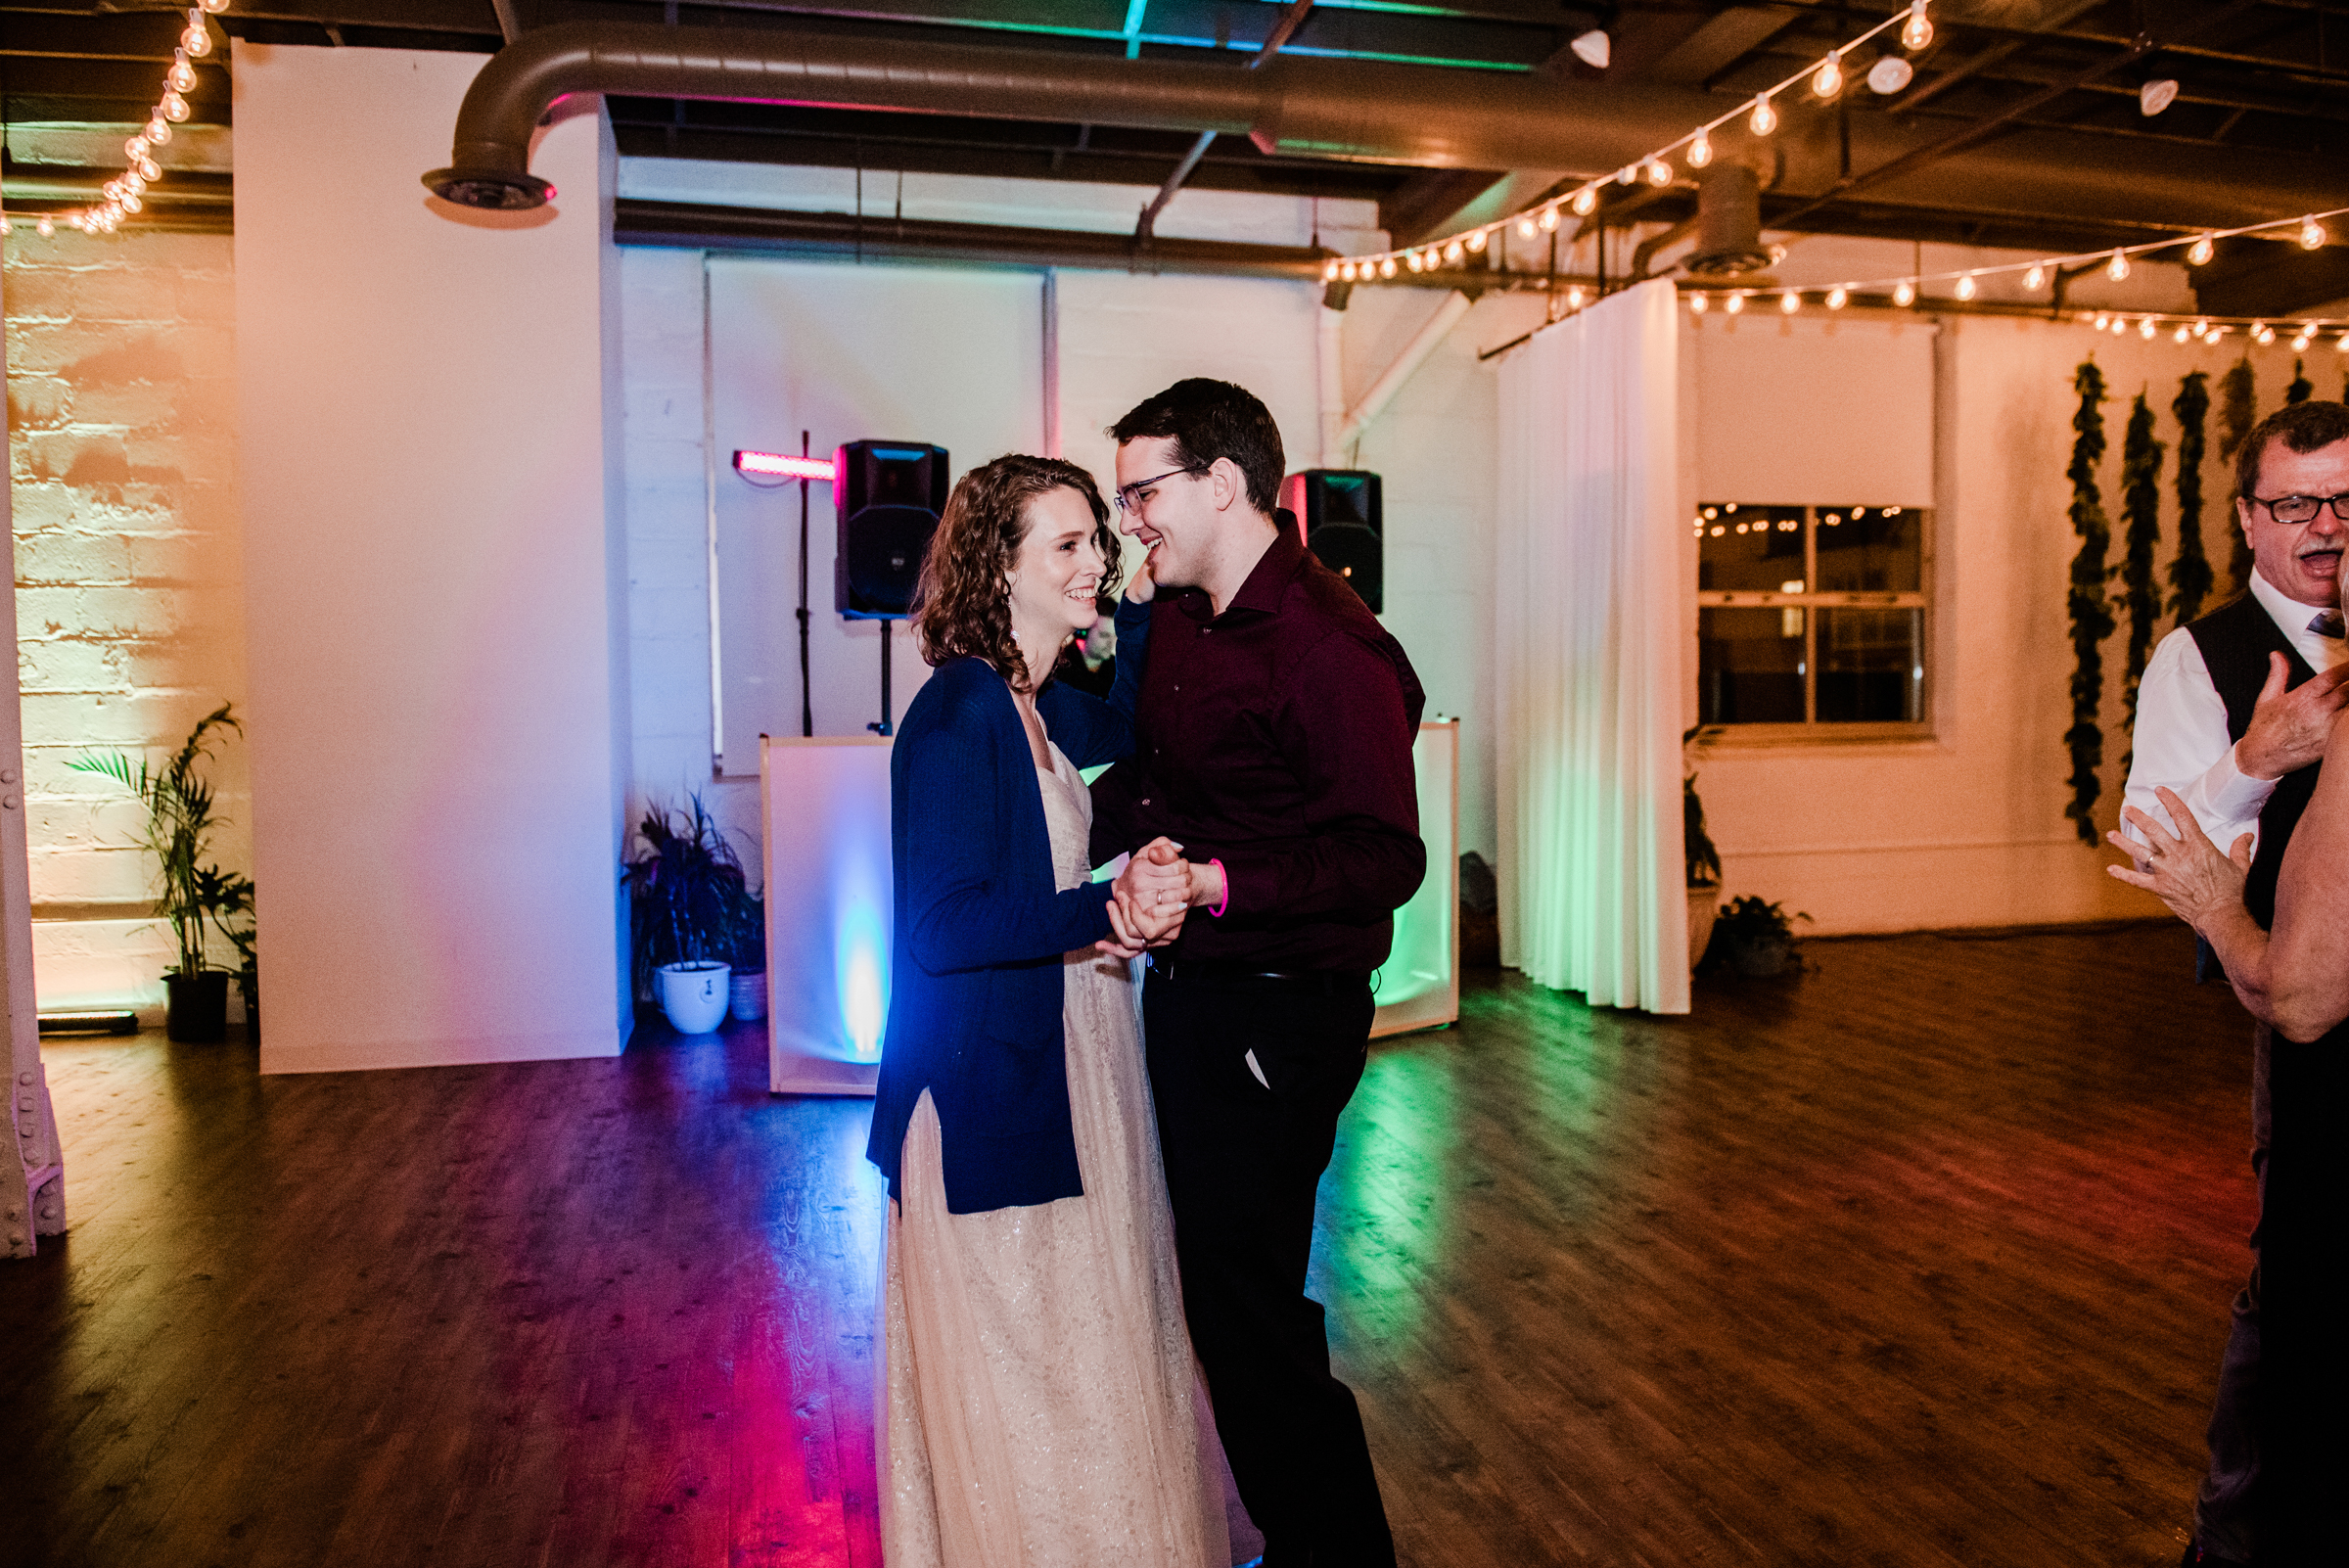 The_Arbor_LoftRochester_Wedding_JILL_STUDIO_Rochester_NY_Photographer_203646.jpg